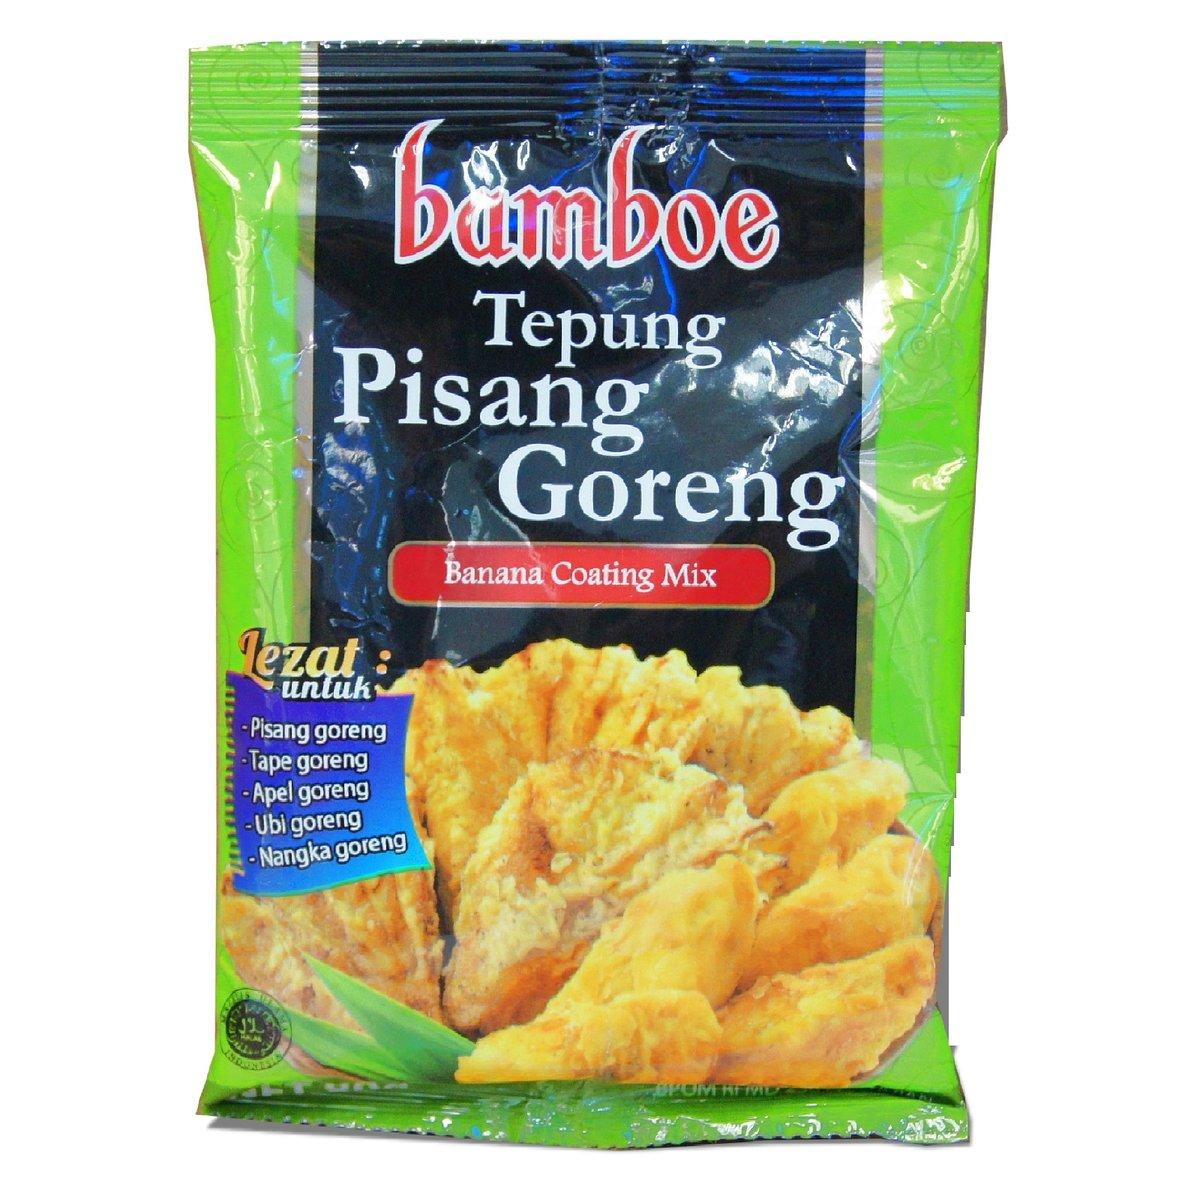 Bamboe - Banana Coating Mix (Bag)